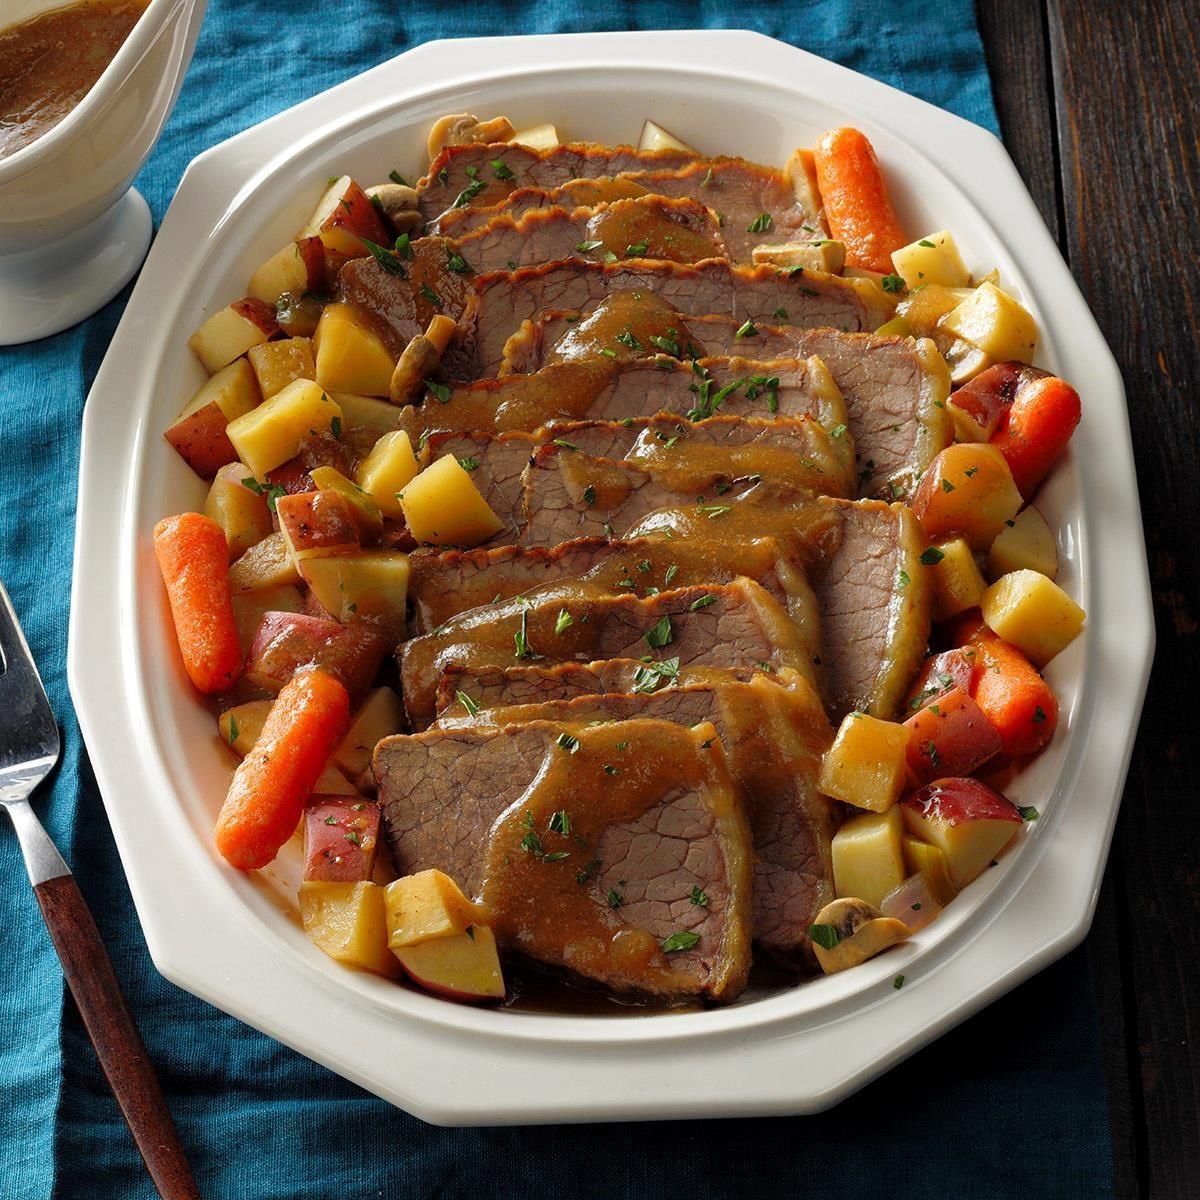 Day 28: Beef Roast Dinner